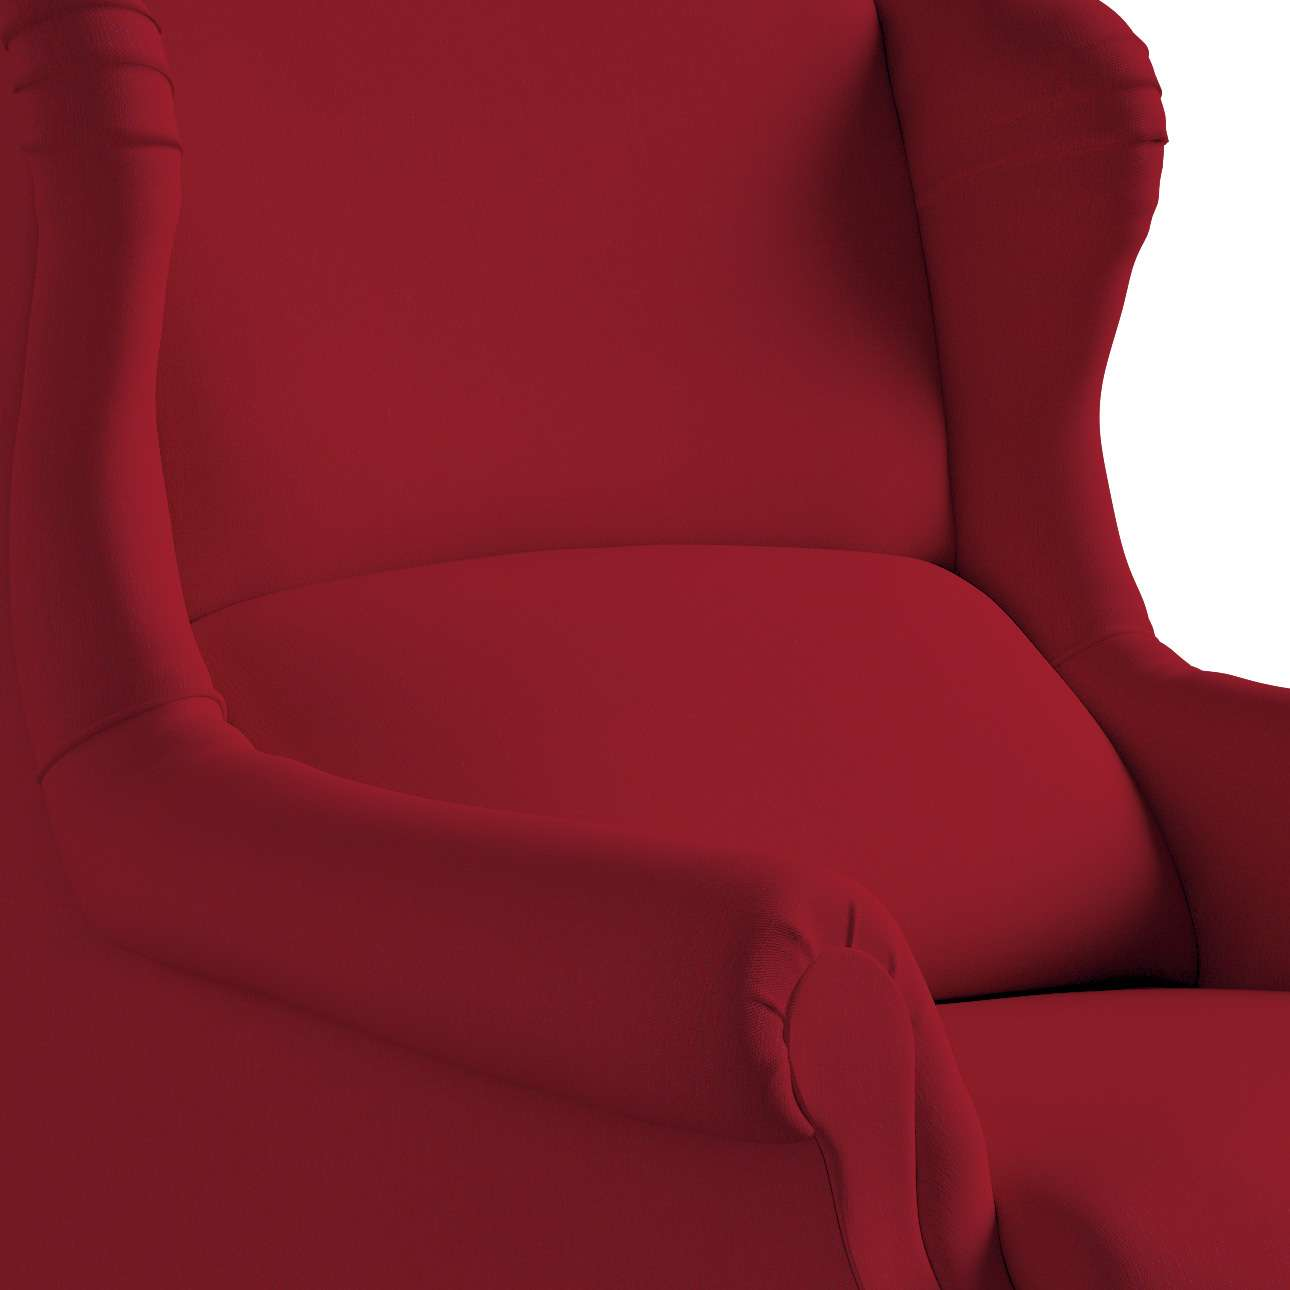 Stilingas Dekoria fotelis 63 x 115 cm kolekcijoje Chenille, audinys: 702-24